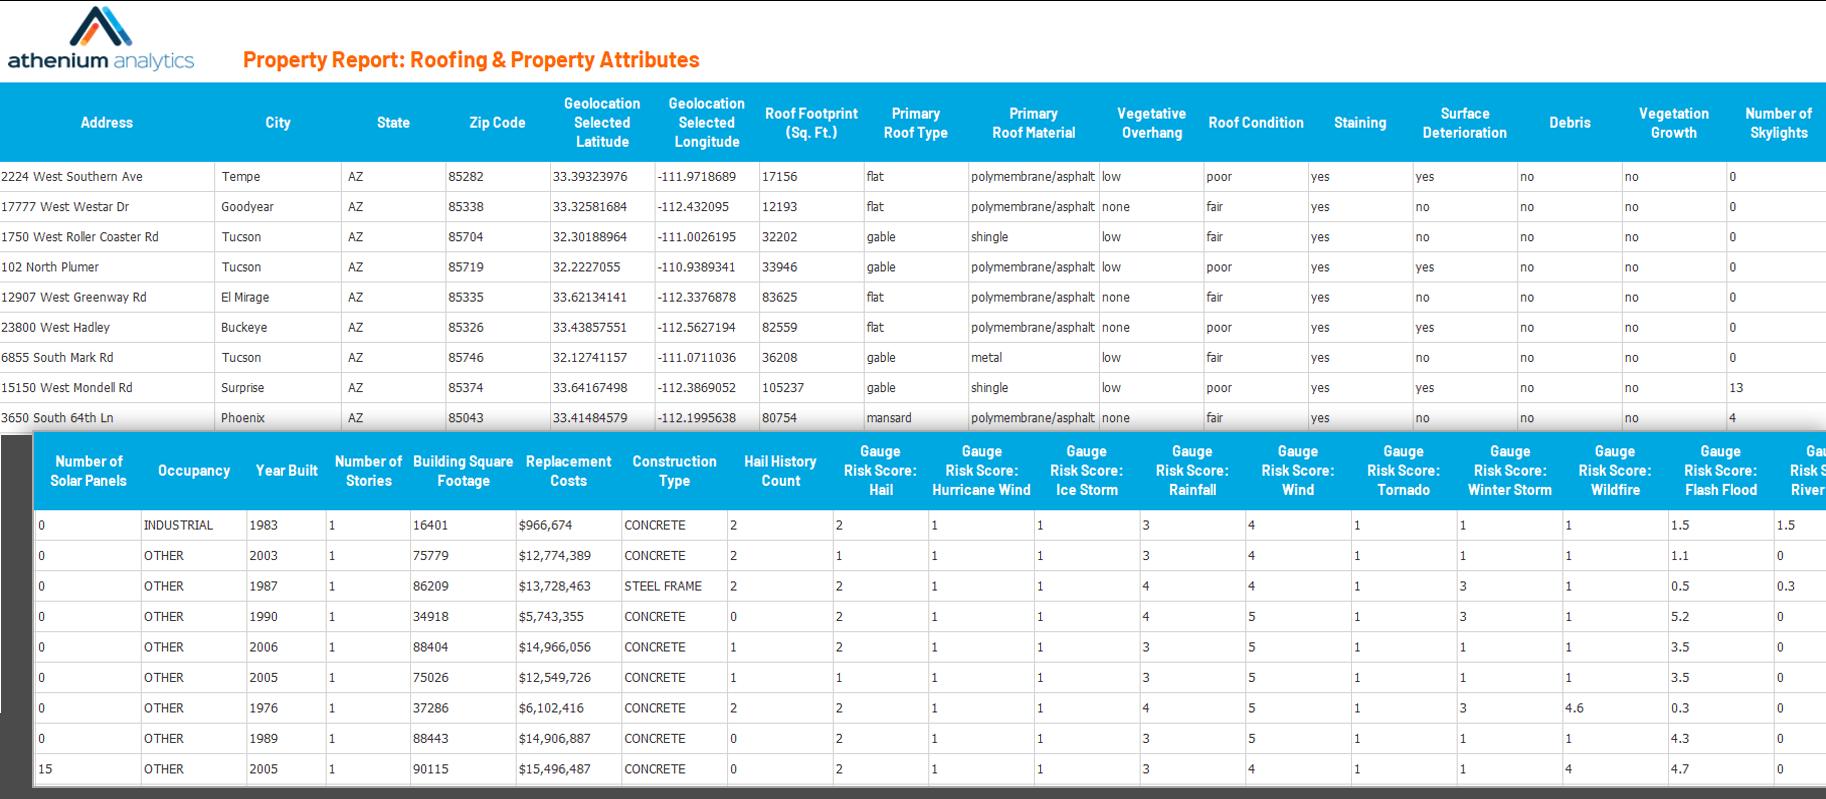 Property risk analytics report from Athenium Analytics